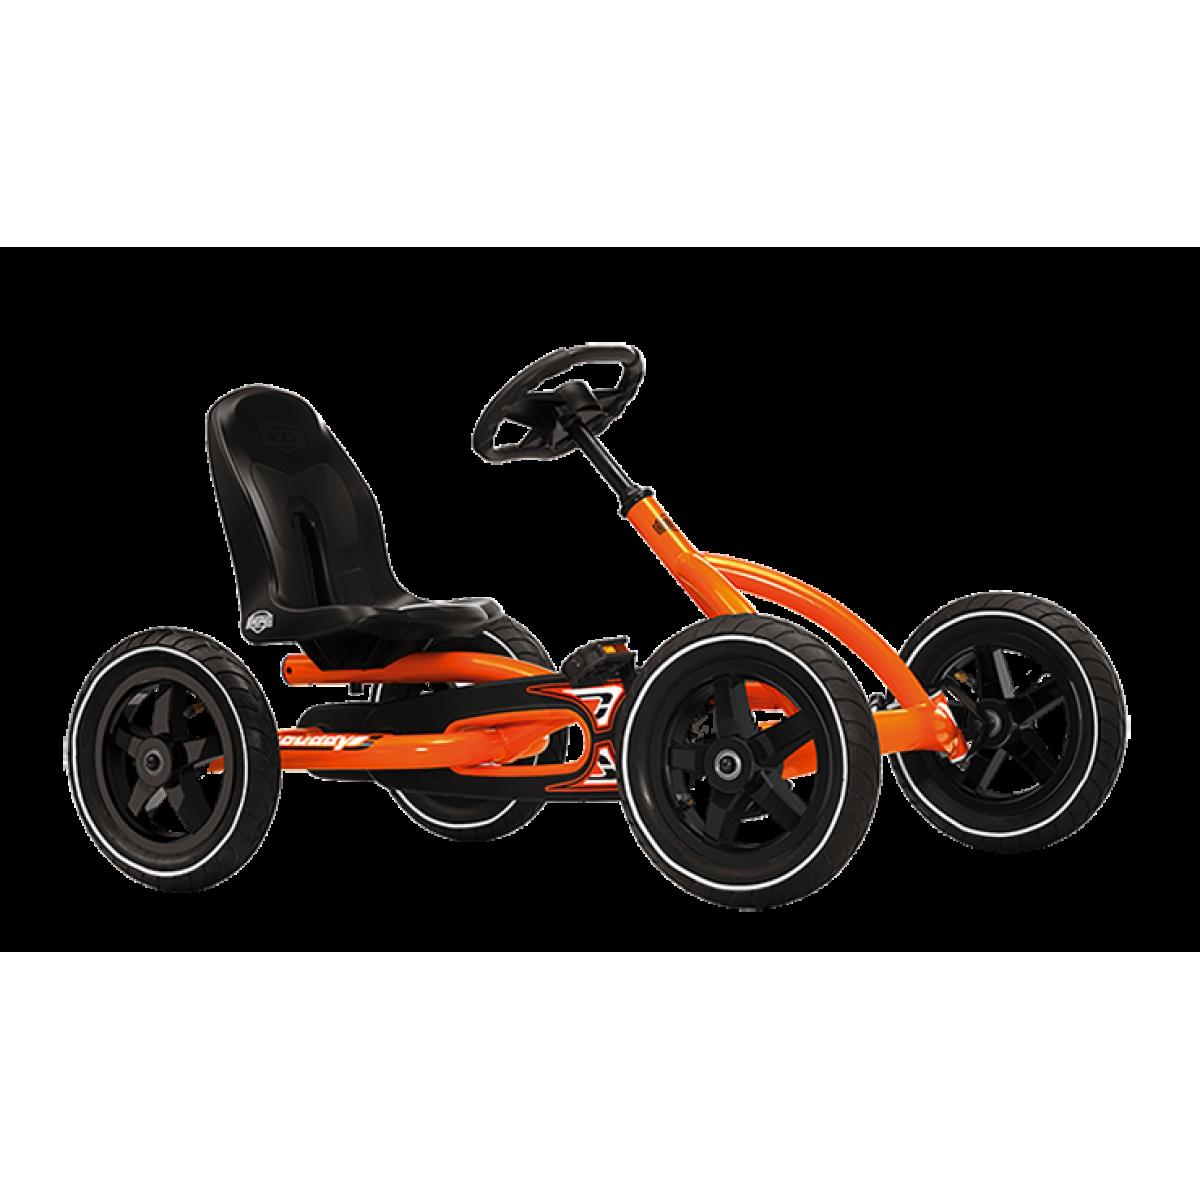 Веломобиль  Buddy Orange - Веломобили BERG, артикул: 160774